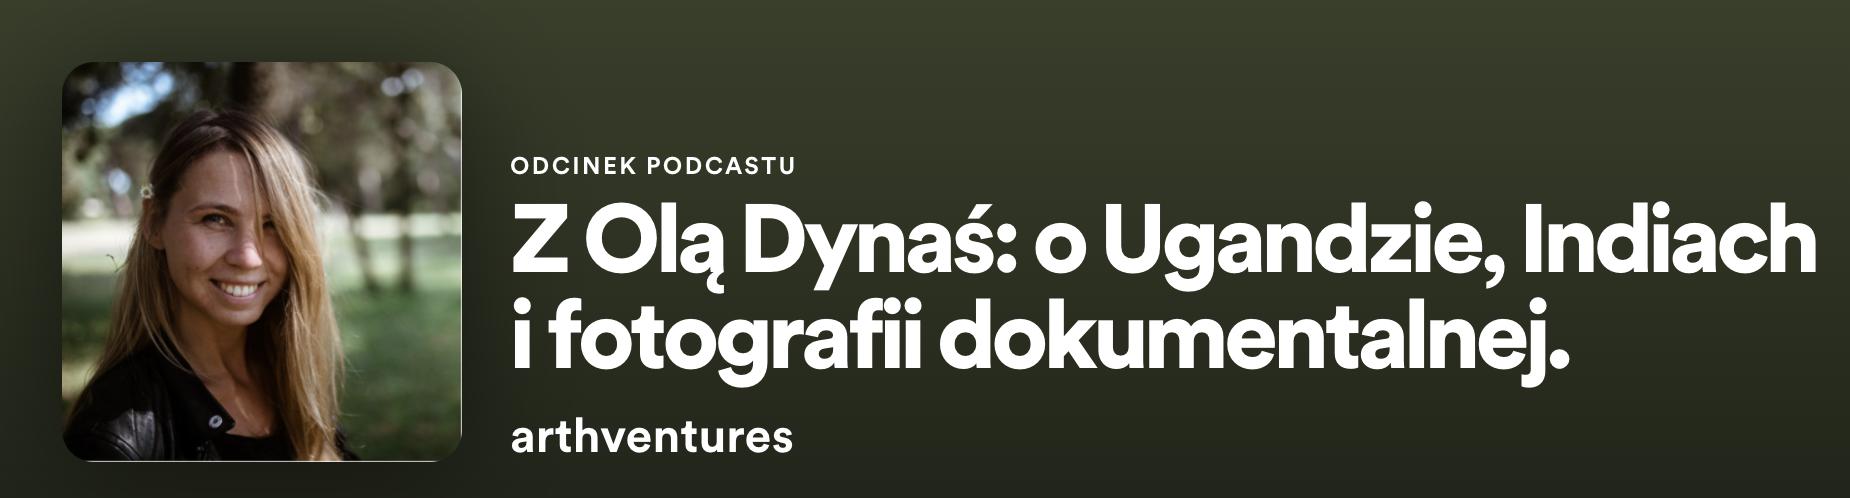 arthventures Aleksandra Dynas